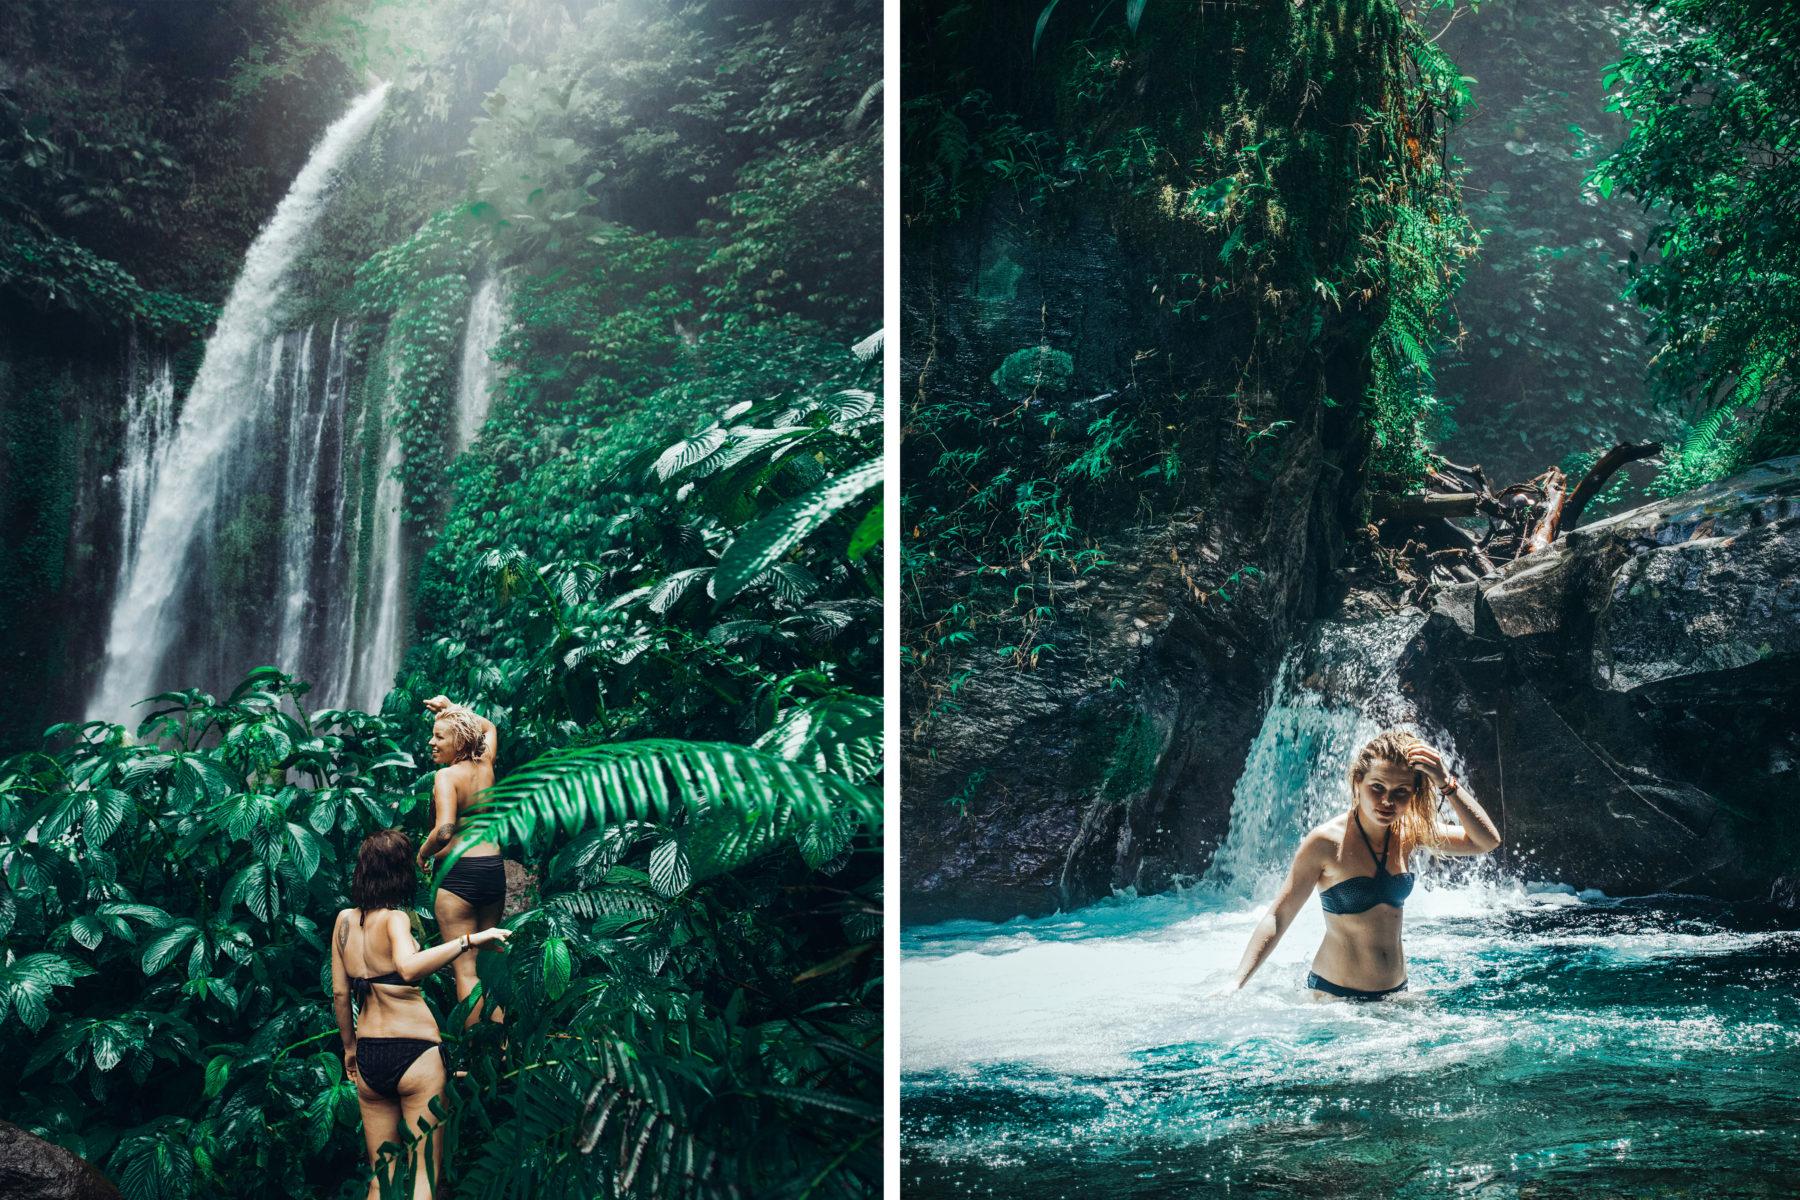 lombok indonesia waterfall green lush jungle exploring traveling swim jungle tiu kelep